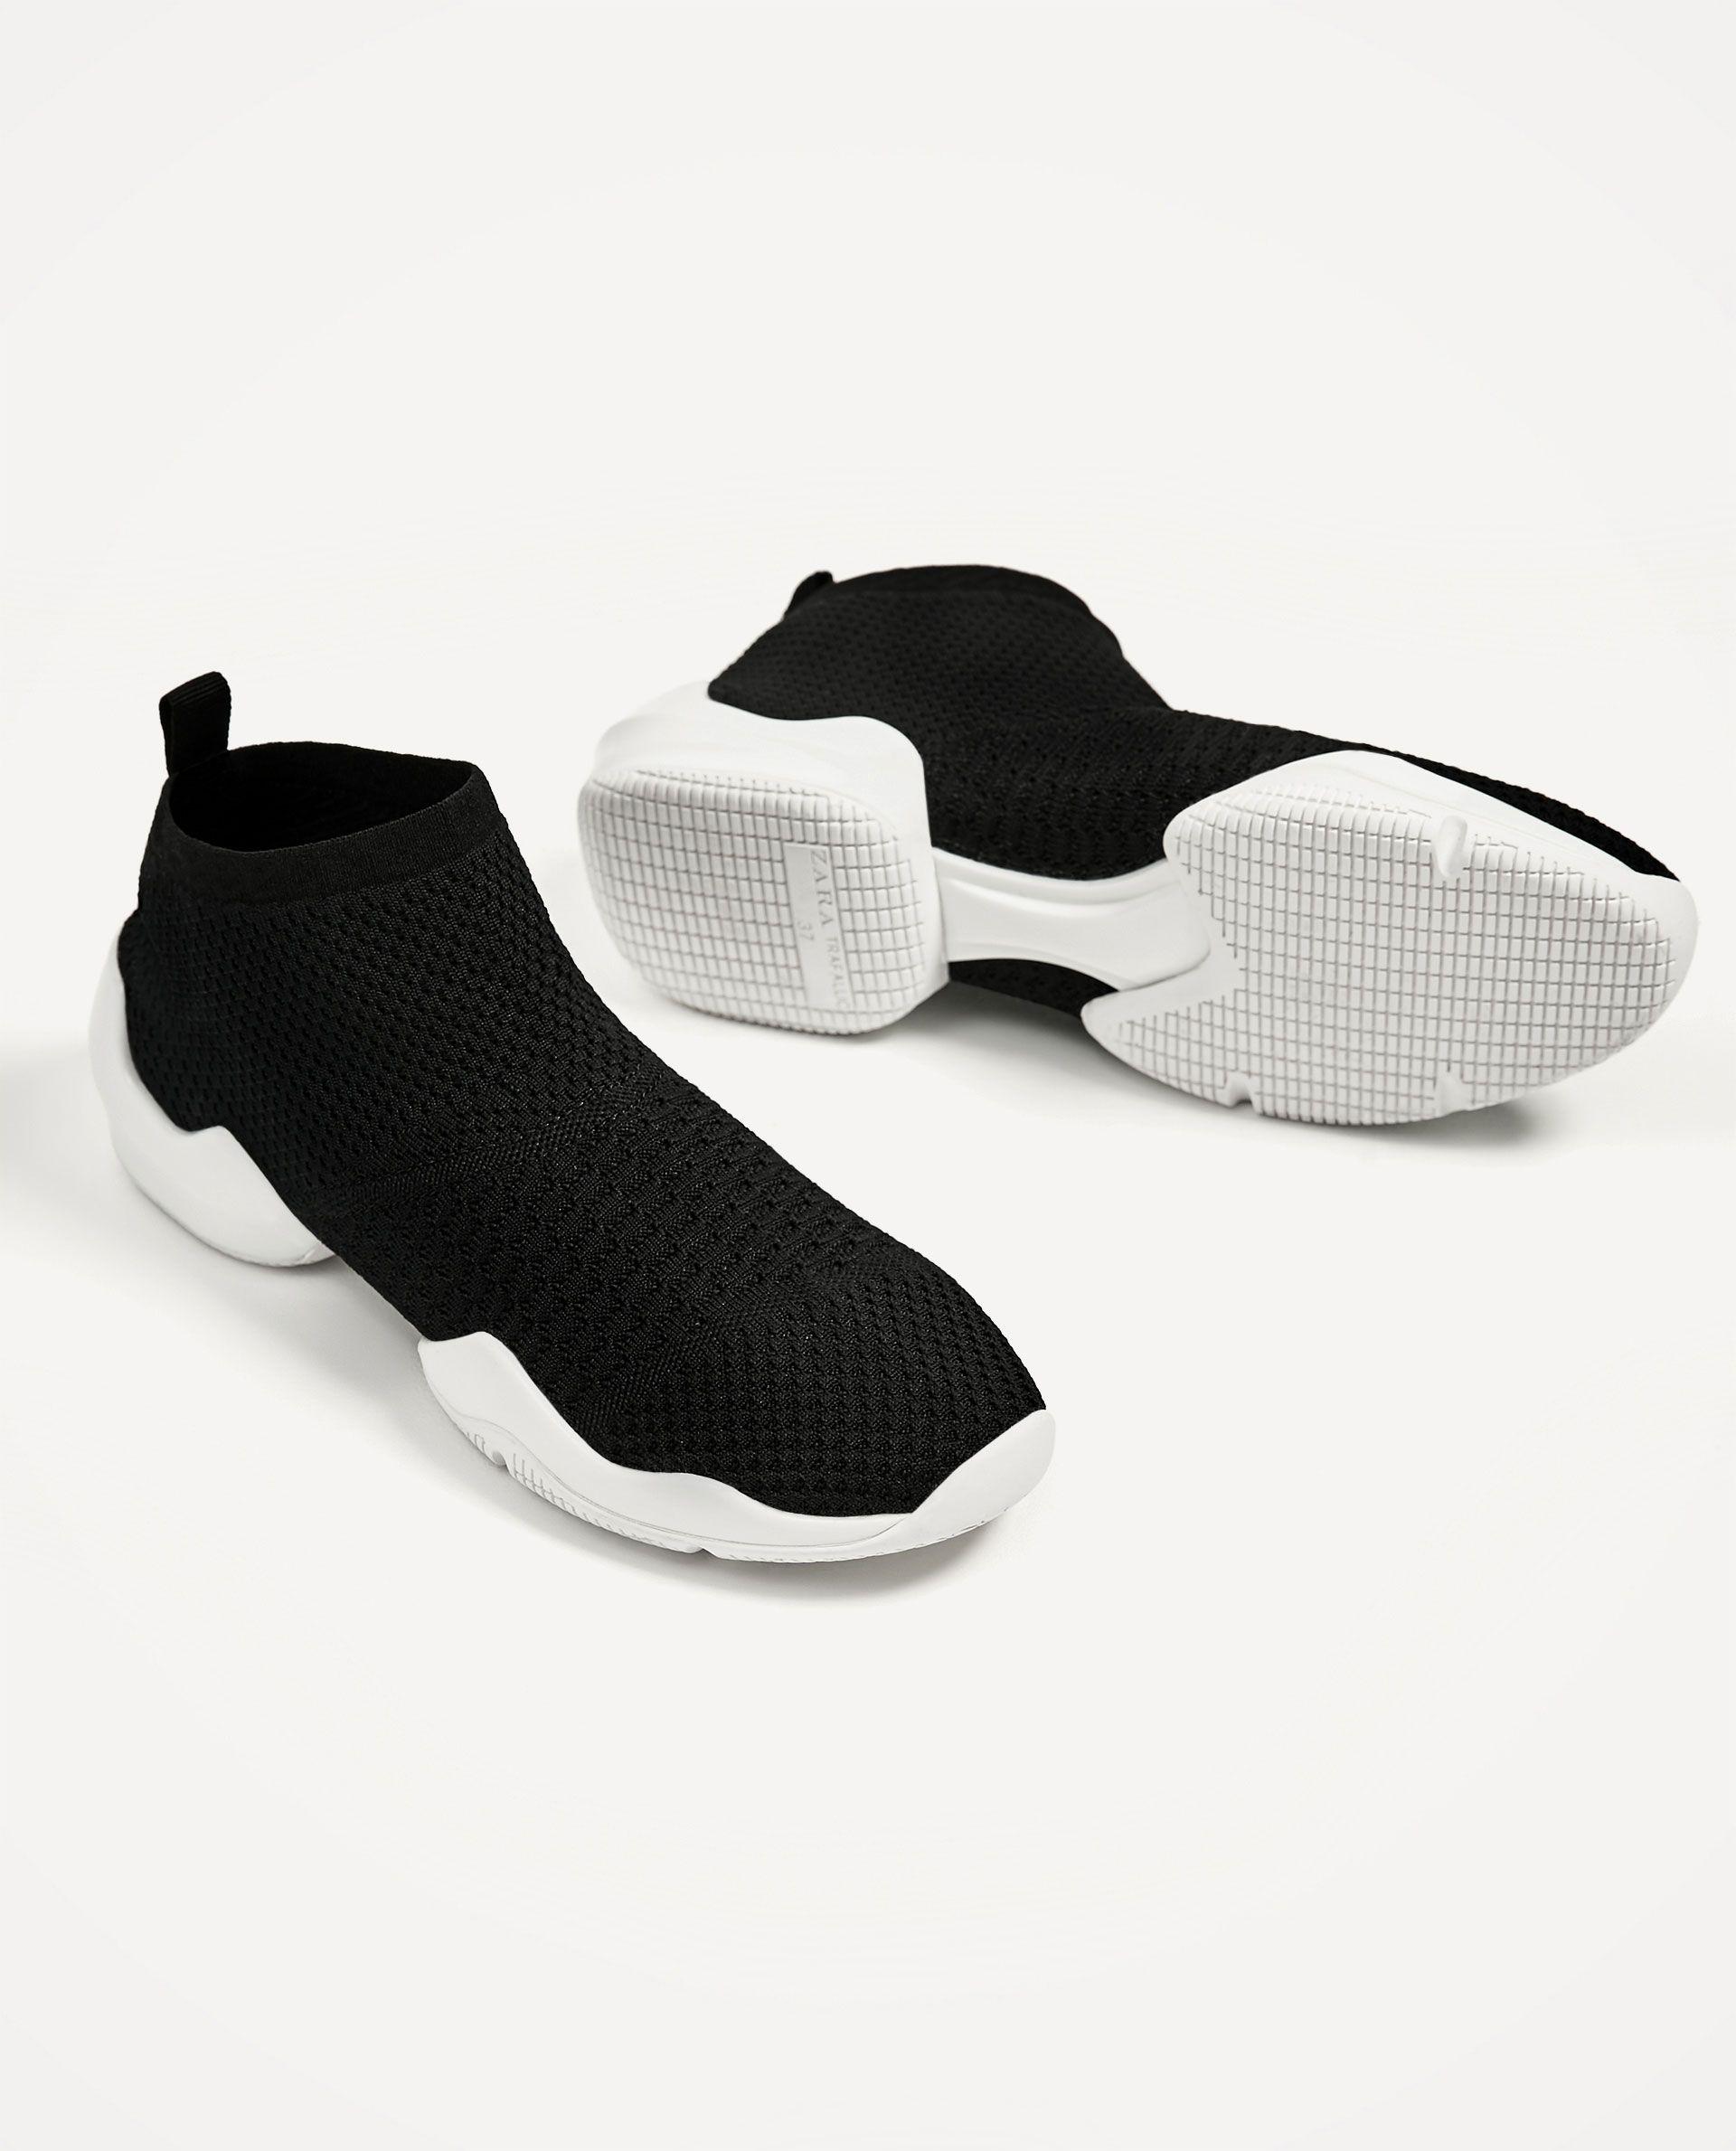 Sock Sneakers Zara Socks Sneakers Zara Sneakers Sneaker Outfits Women